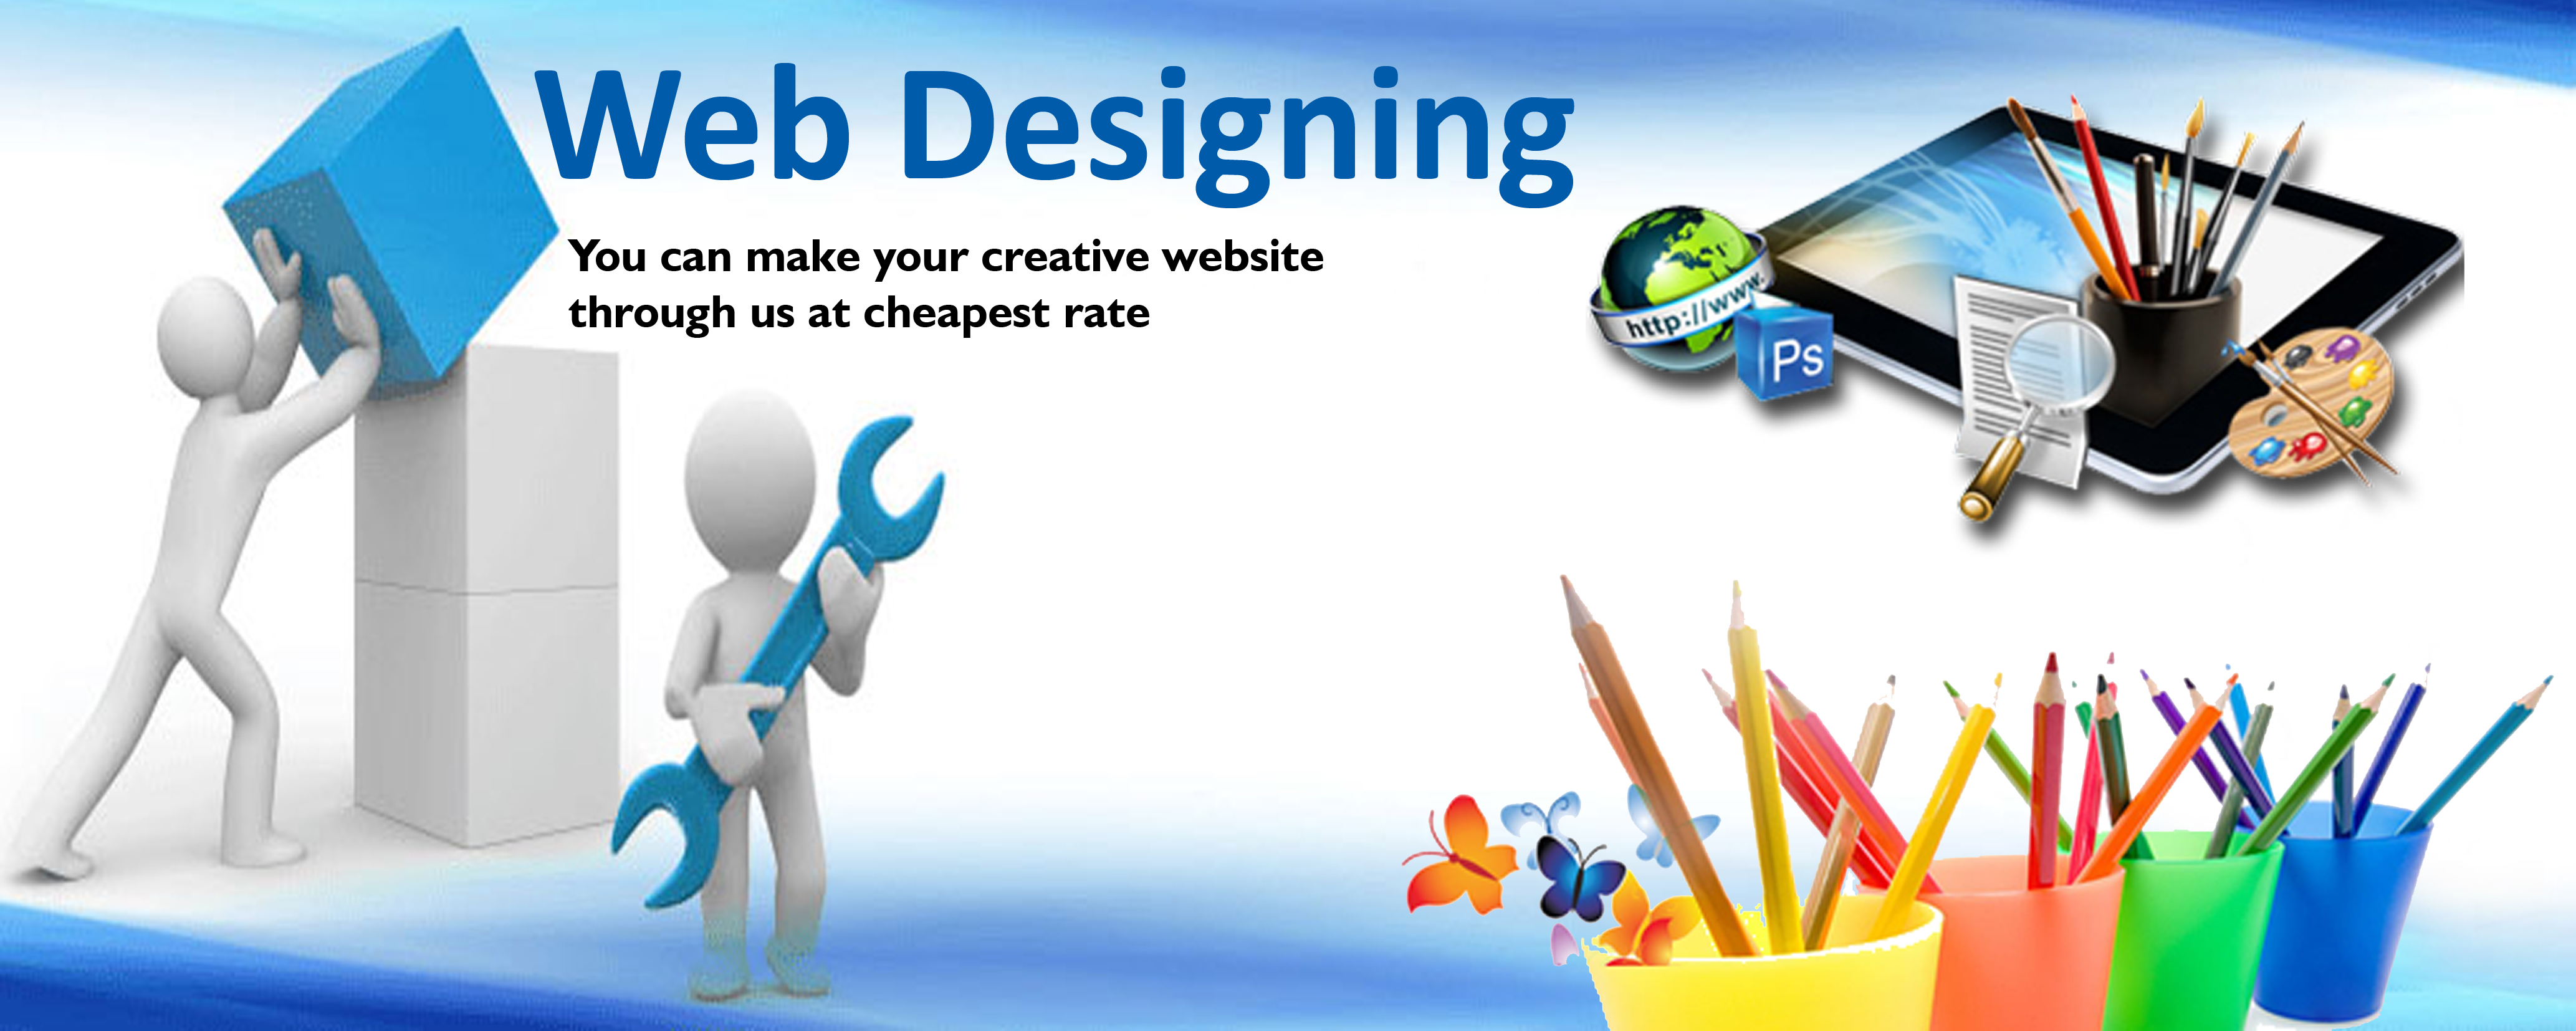 Cheep Webb Design